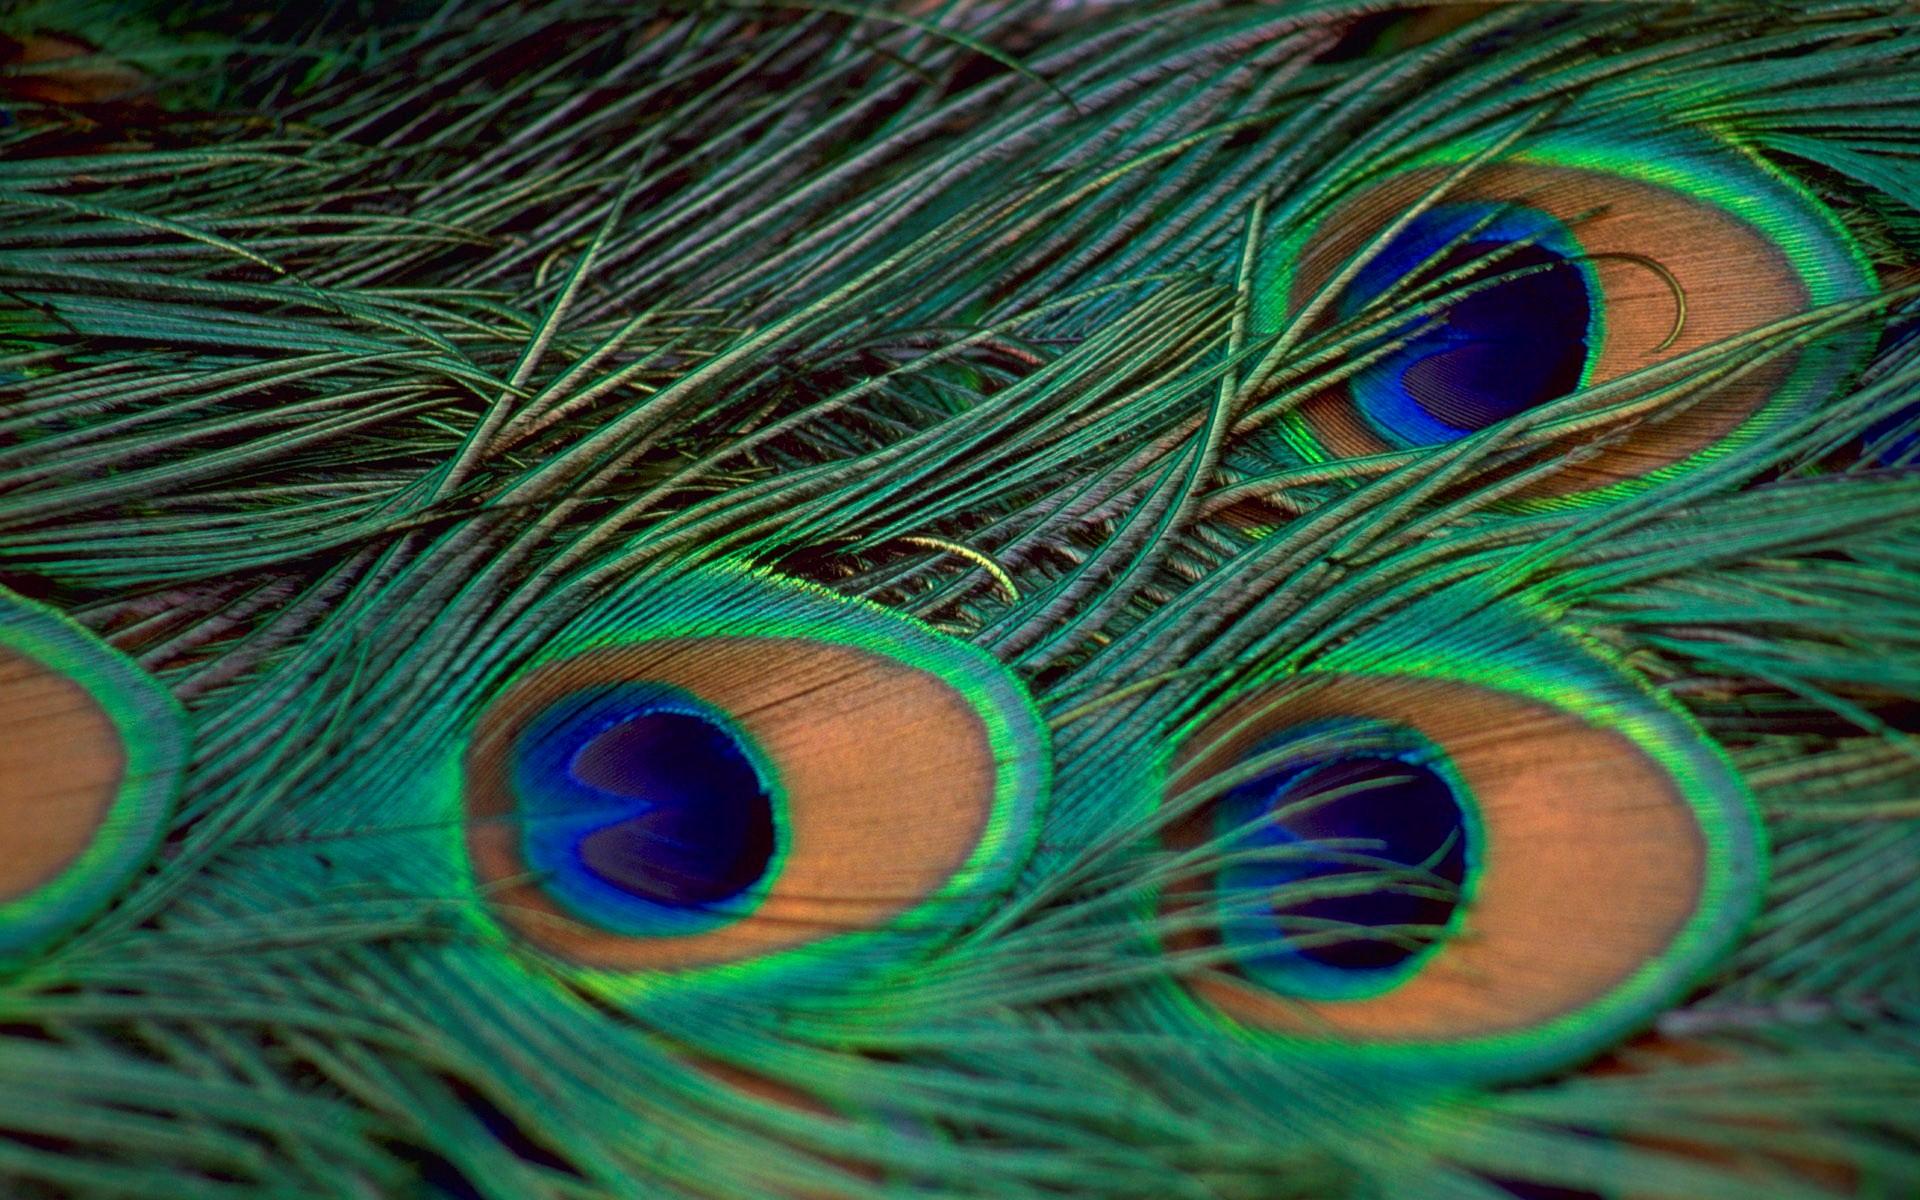 Wallpaper Name  Green and Blue Peacock Bird Feather HD Wallpaper 1920x1200